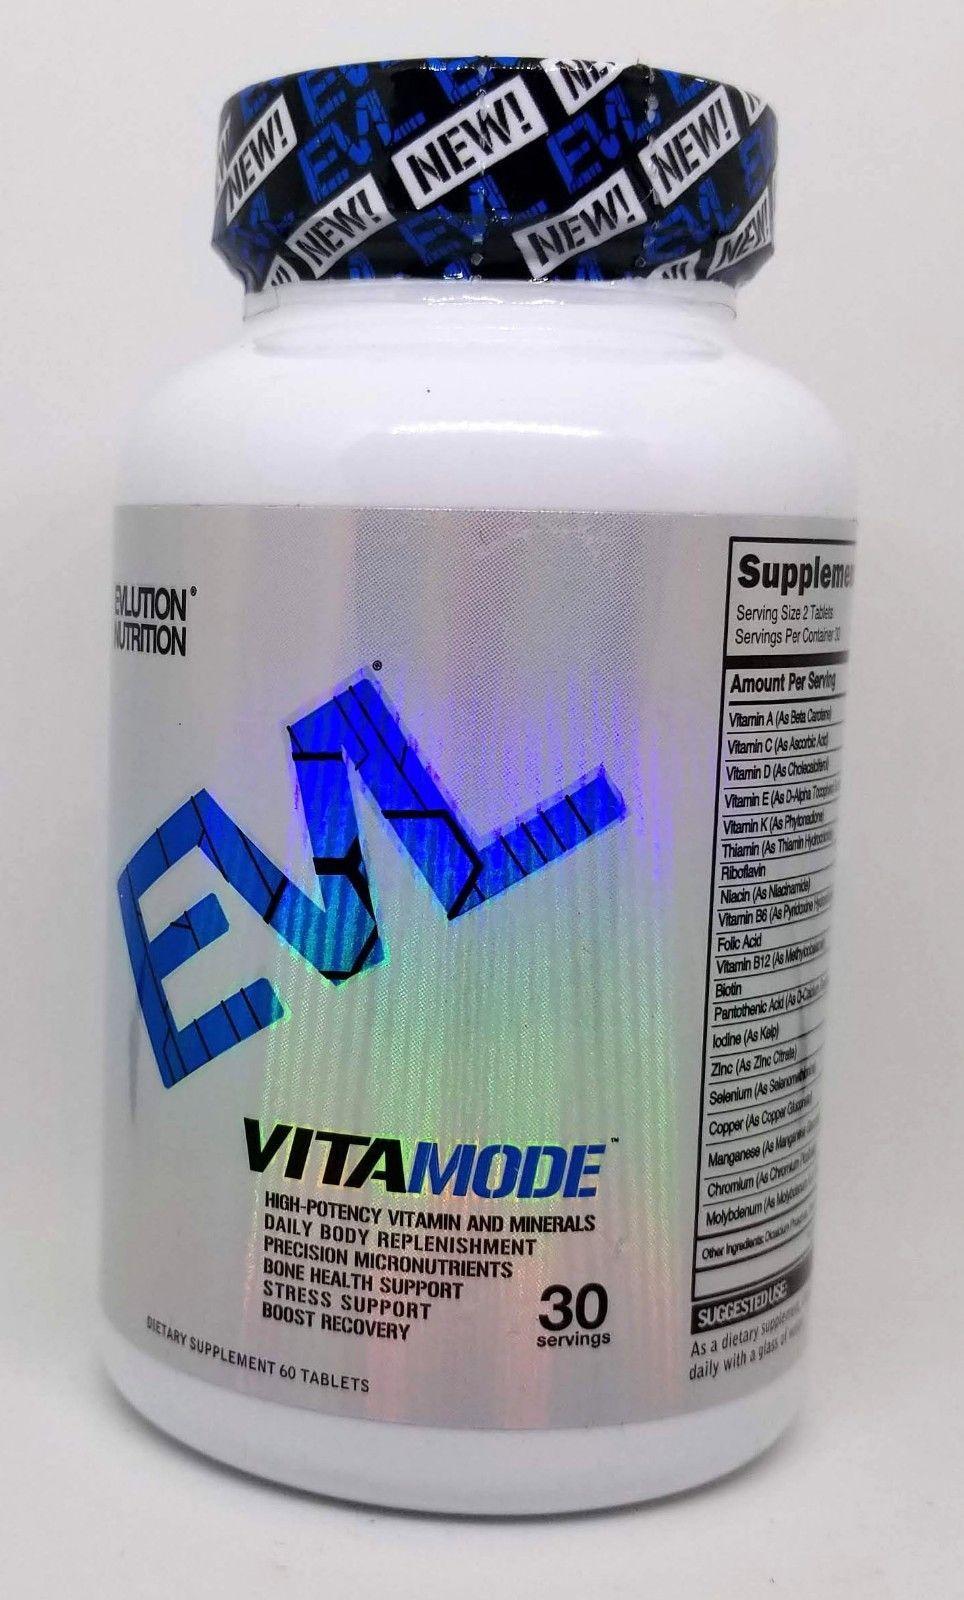 Daily Vitamins, Vitamins, Nutrition